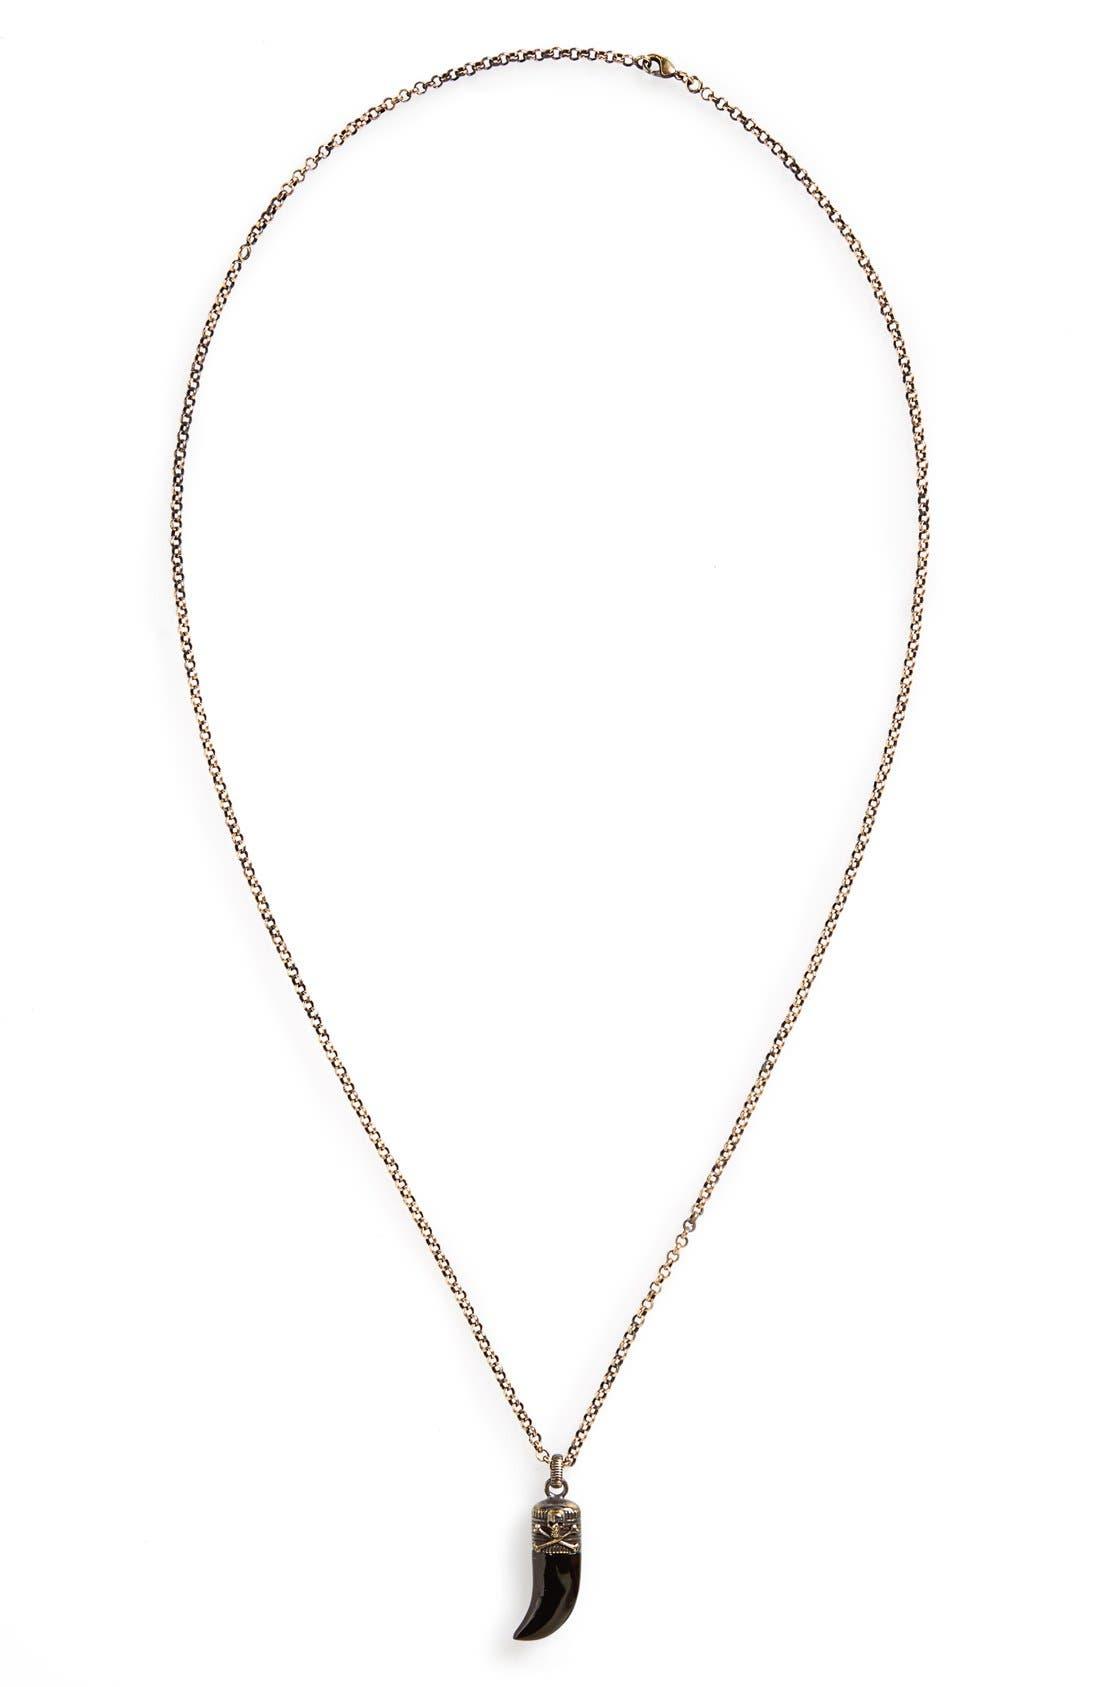 Claw Pendant Necklace,                             Main thumbnail 1, color,                             Black